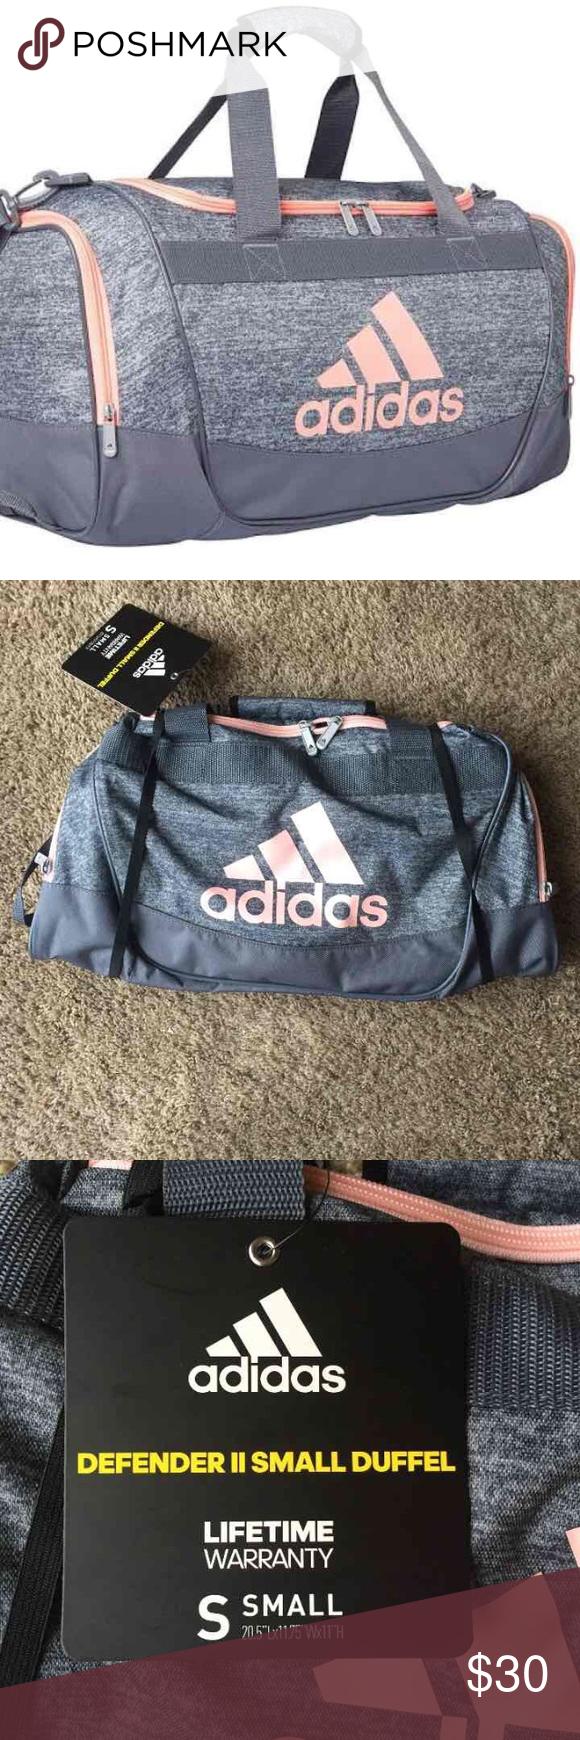 Nike Tennis Duffle Bag Black Pink Polyvore  3a4e23005ada1